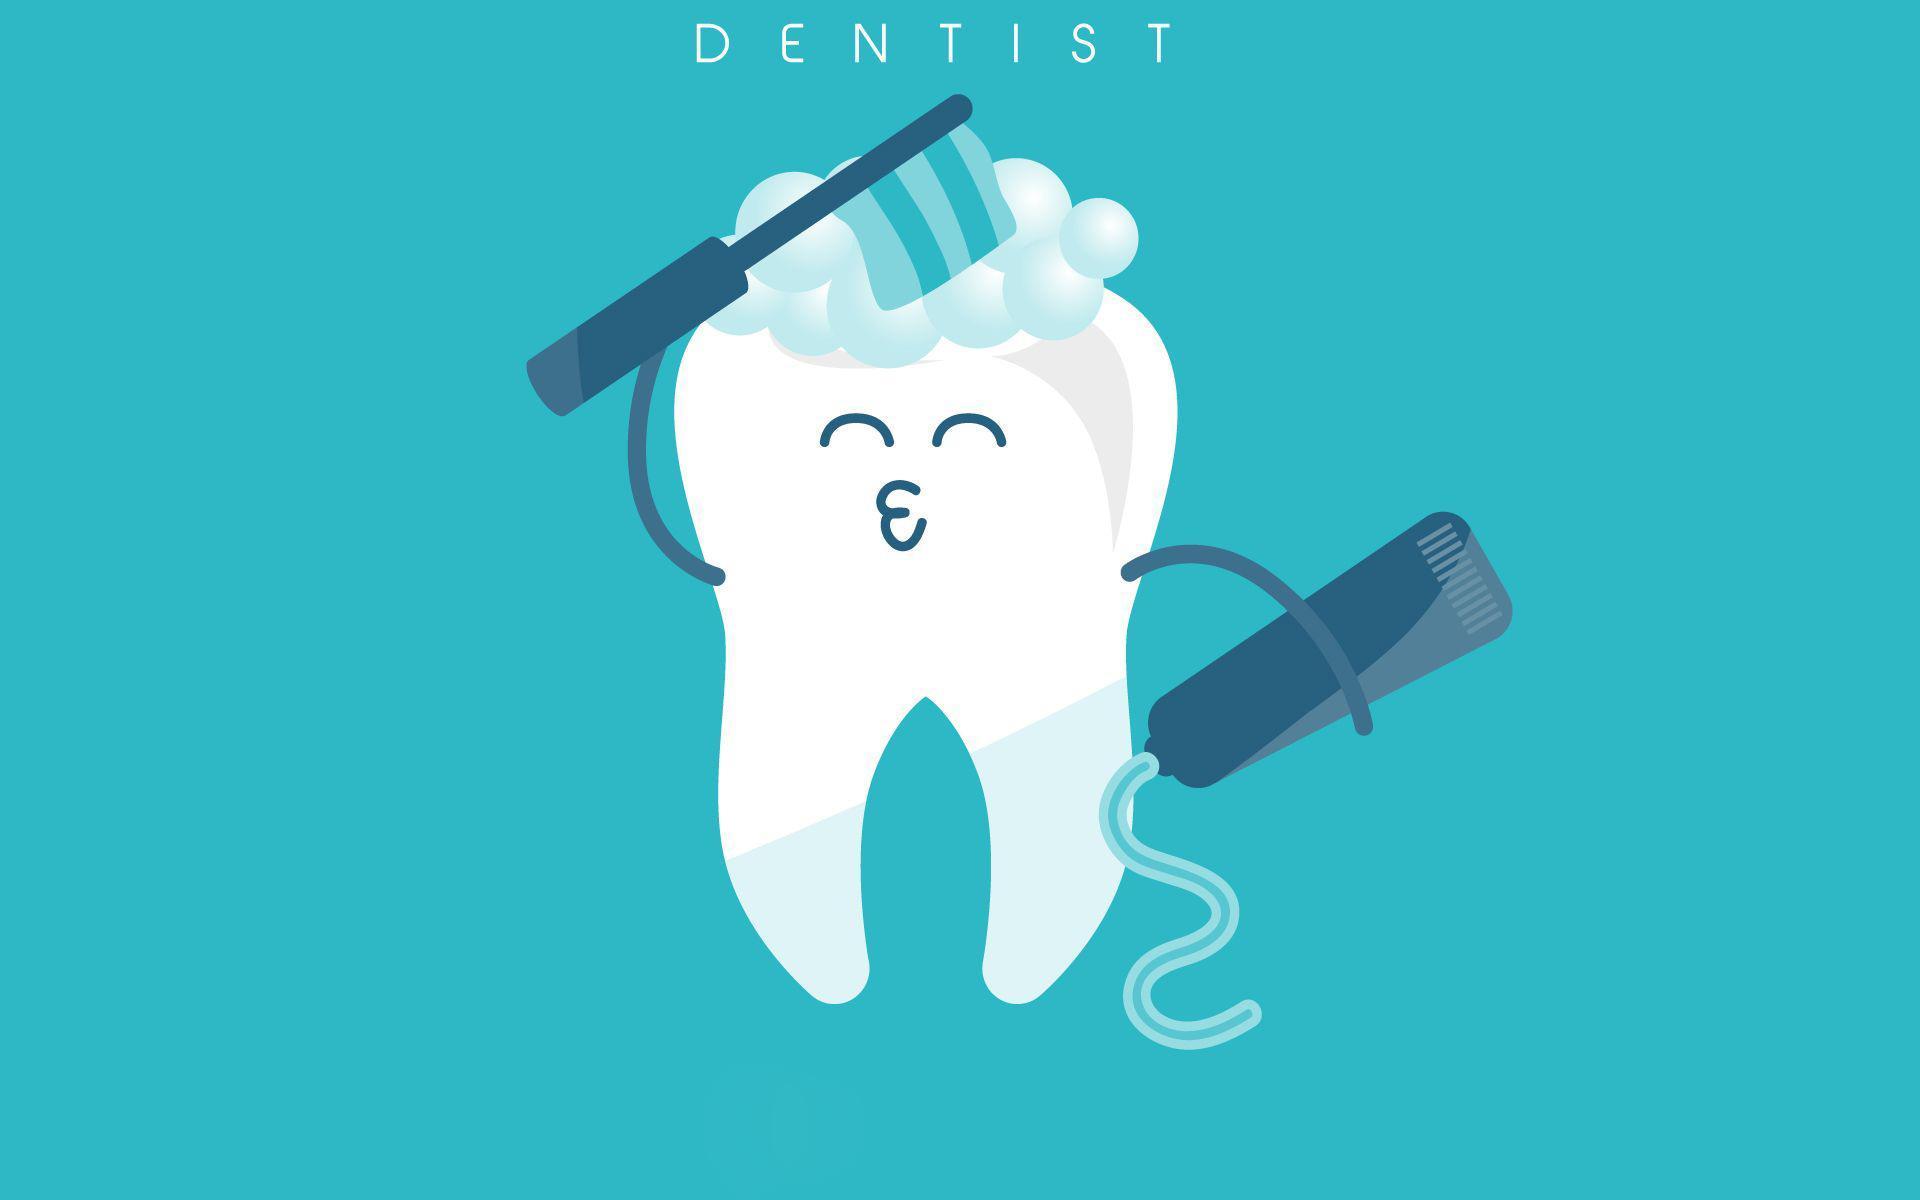 Cute Dental Wallpapers   Top Cute Dental Backgrounds 1920x1200